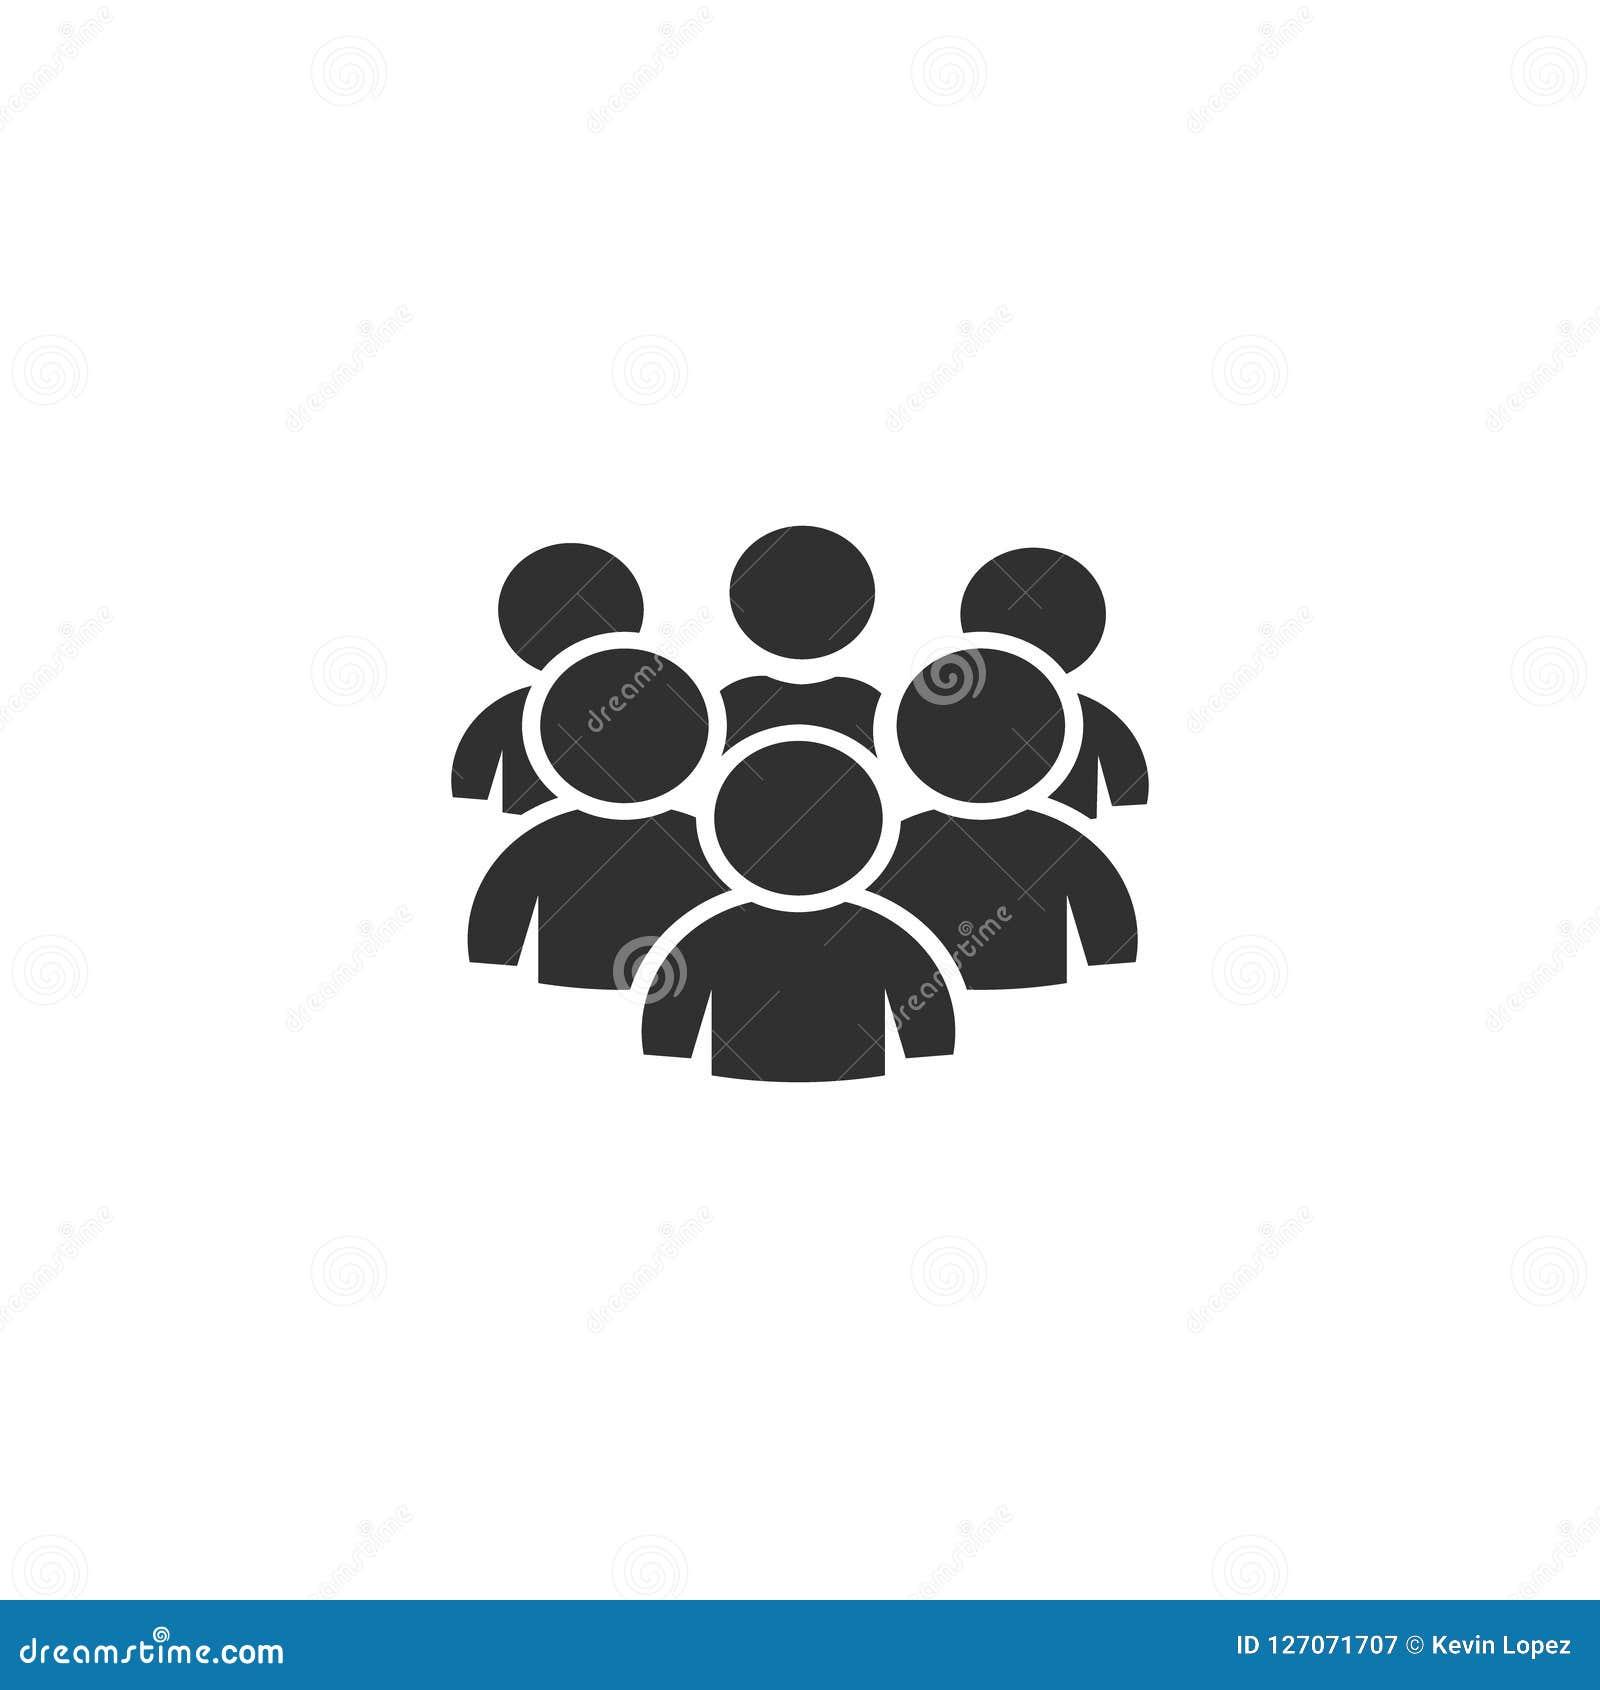 Grupa ludzi, ikona wektor